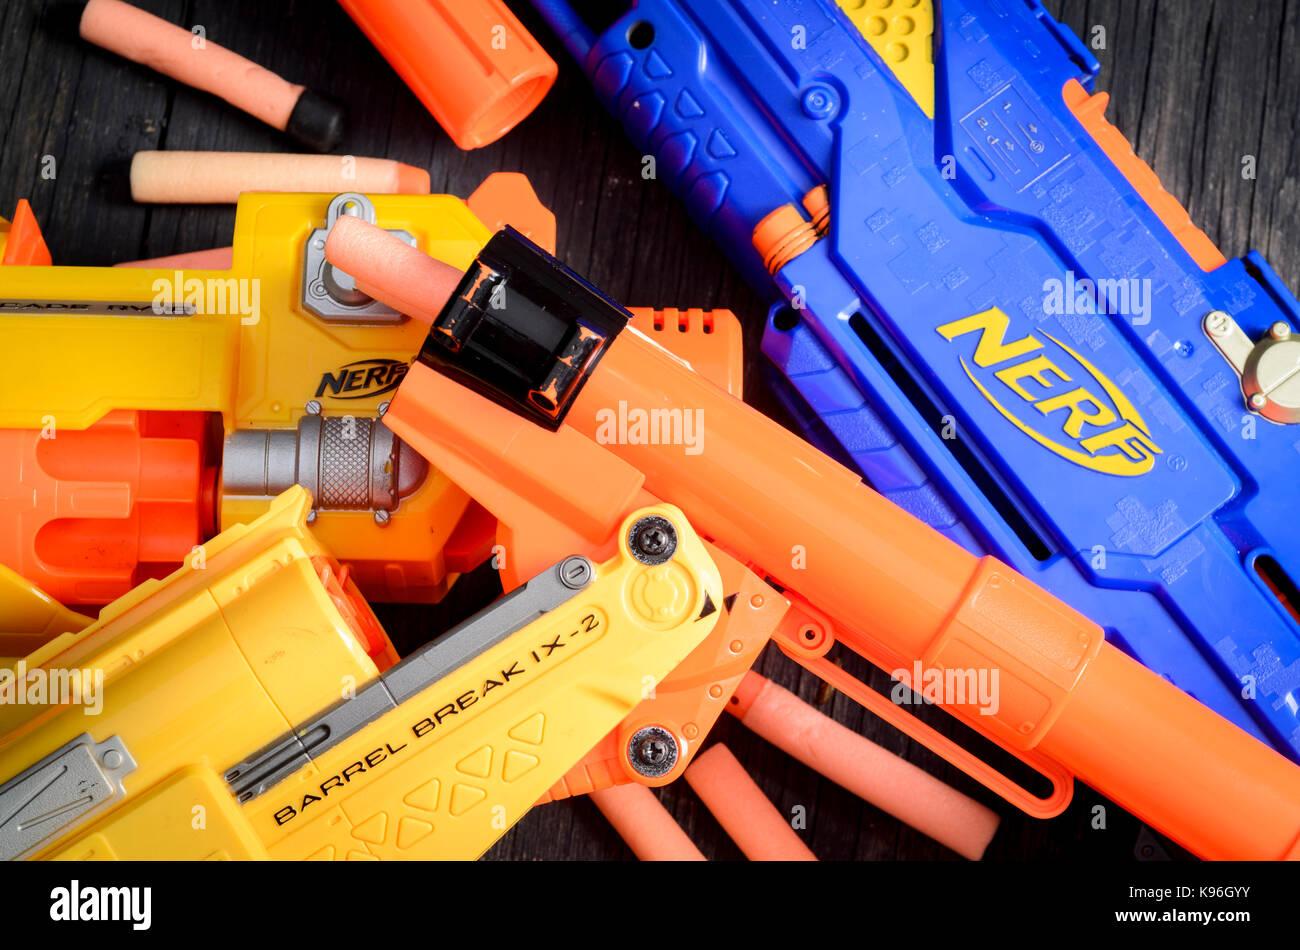 Nerf Dart Gun and Foam Bullets - Stock Image